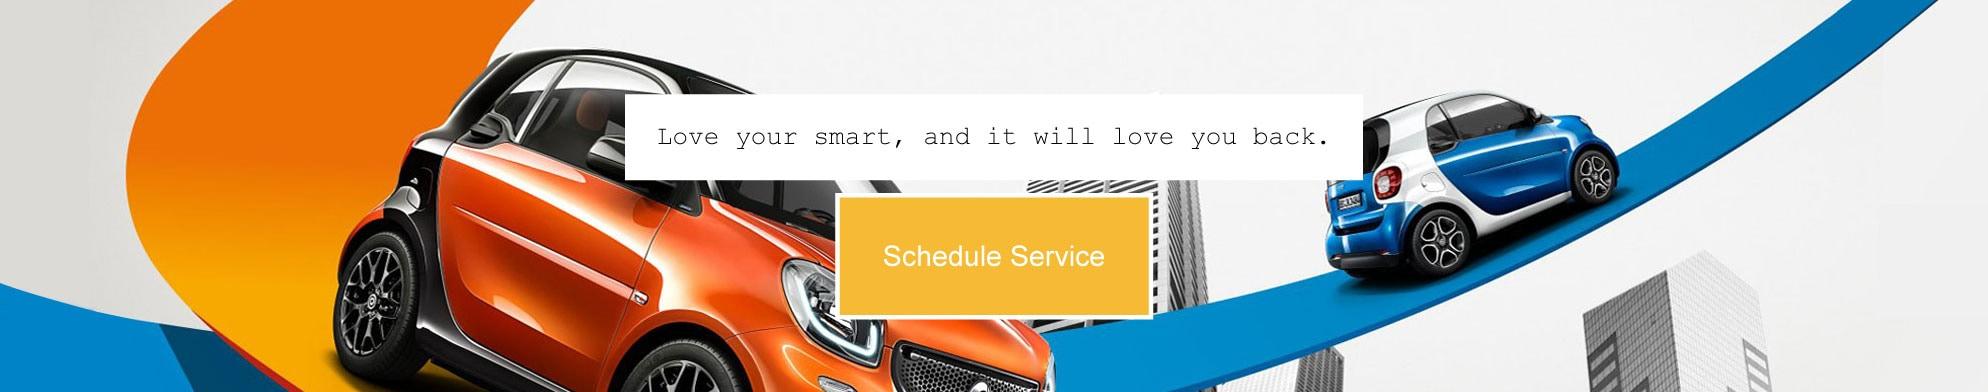 Smart car maintenance schedule mercedes benz dealer in for Schedule b maintenance mercedes benz